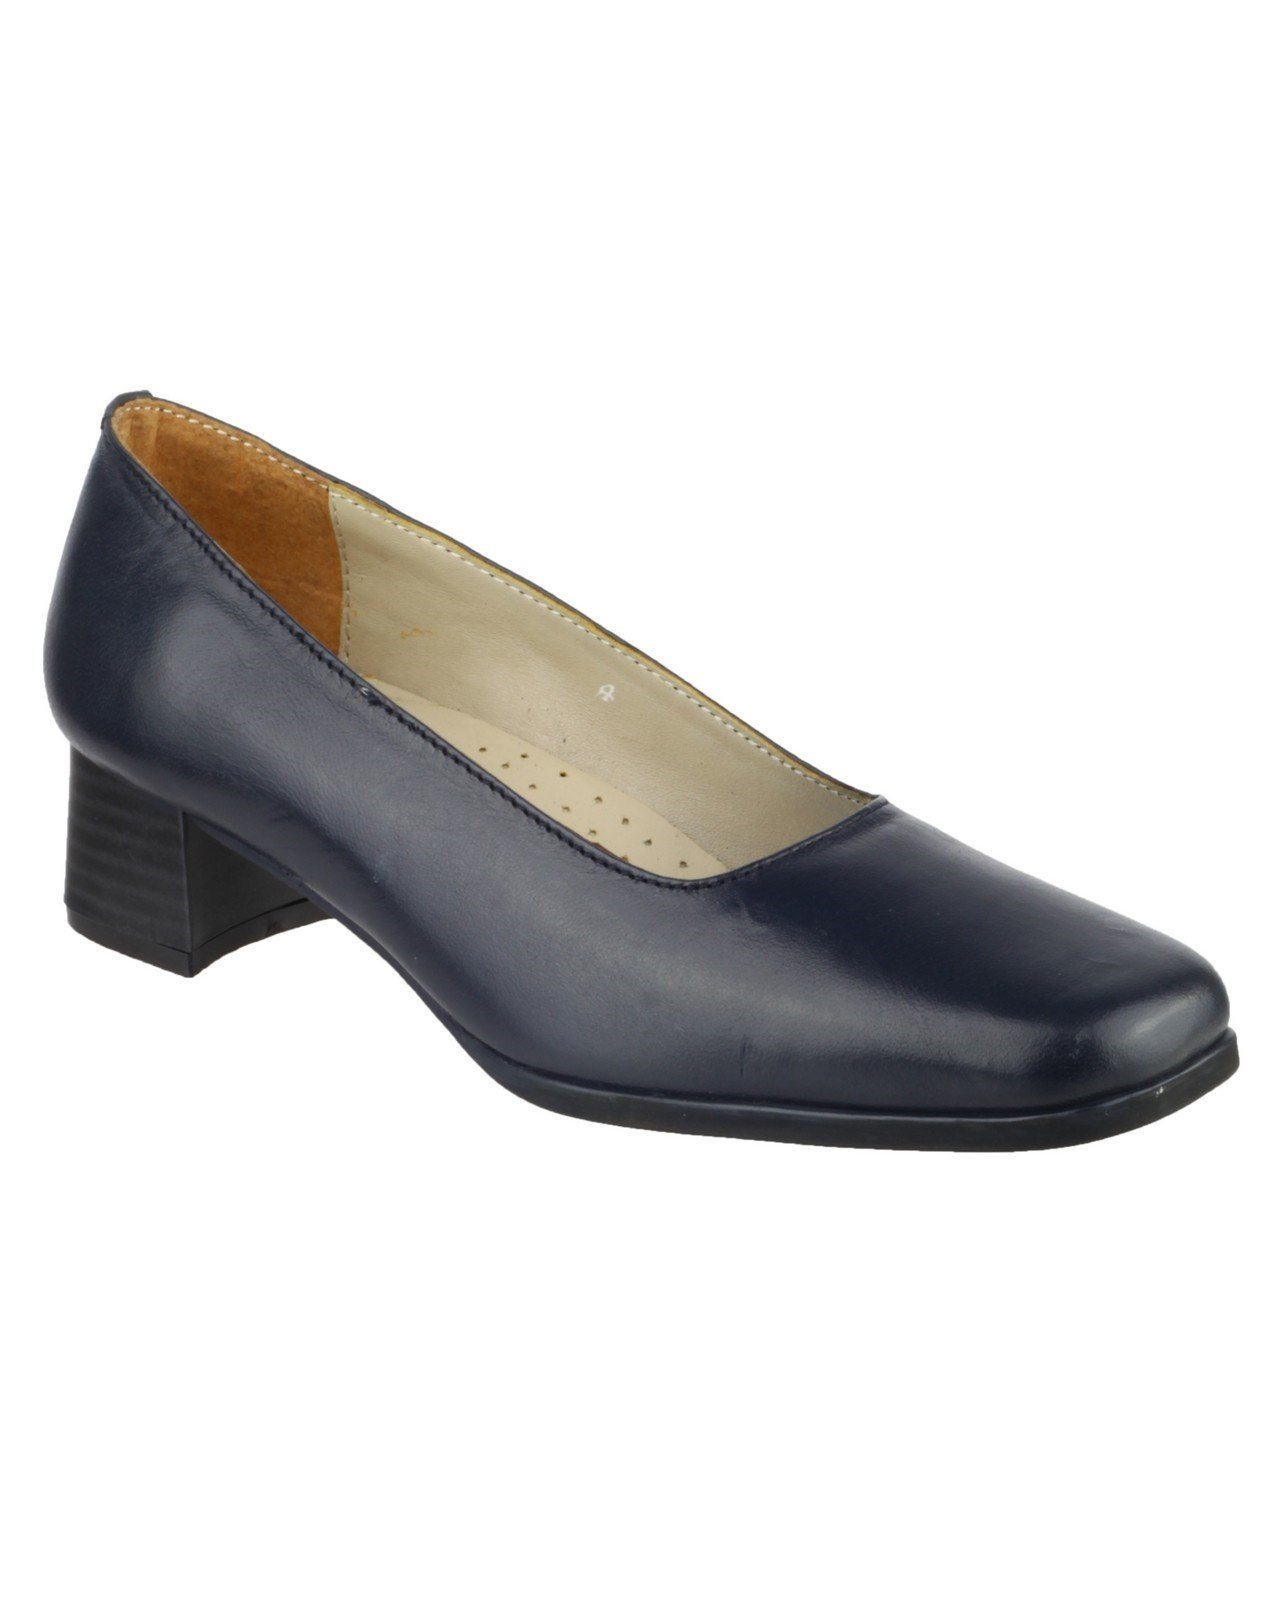 Amblers Women's Walford Court Shoe Black 15904 - Navy 2